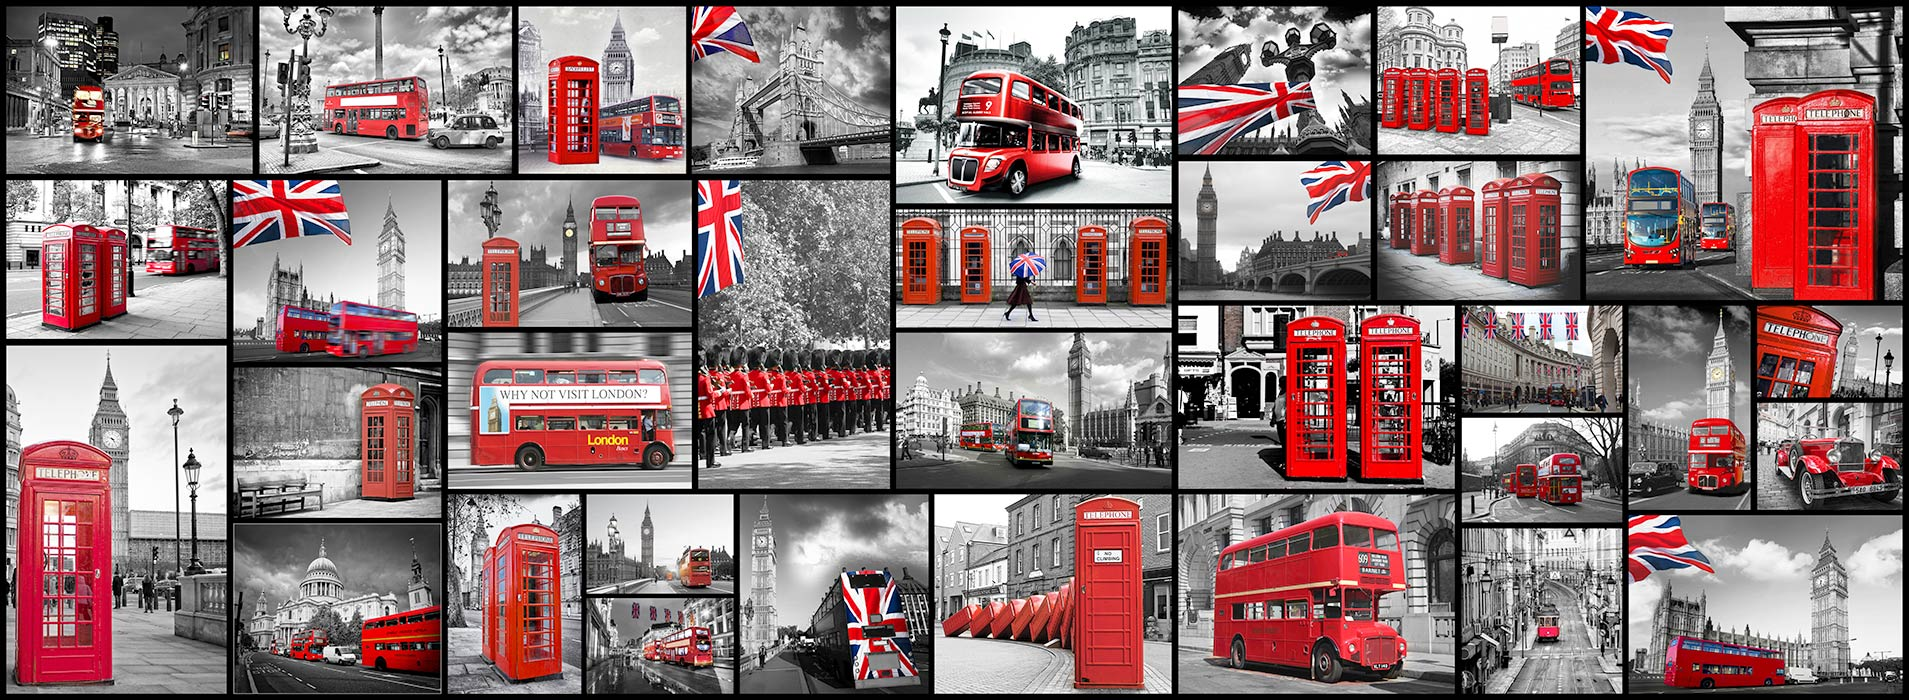 Лондон 58953447